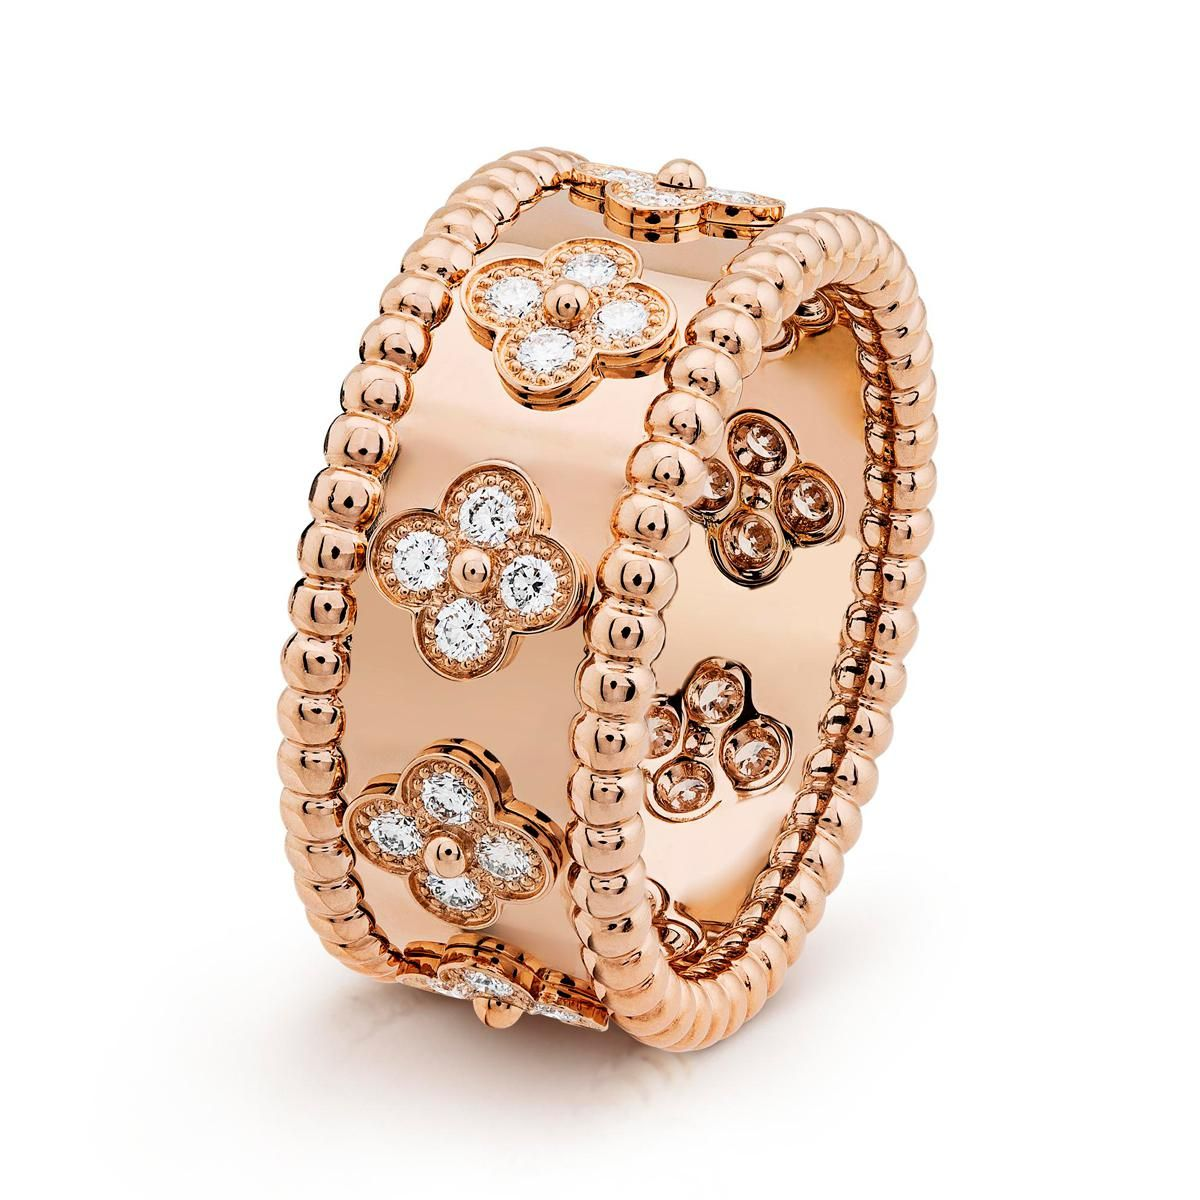 van cleef and arpels perlee clovers ring small model